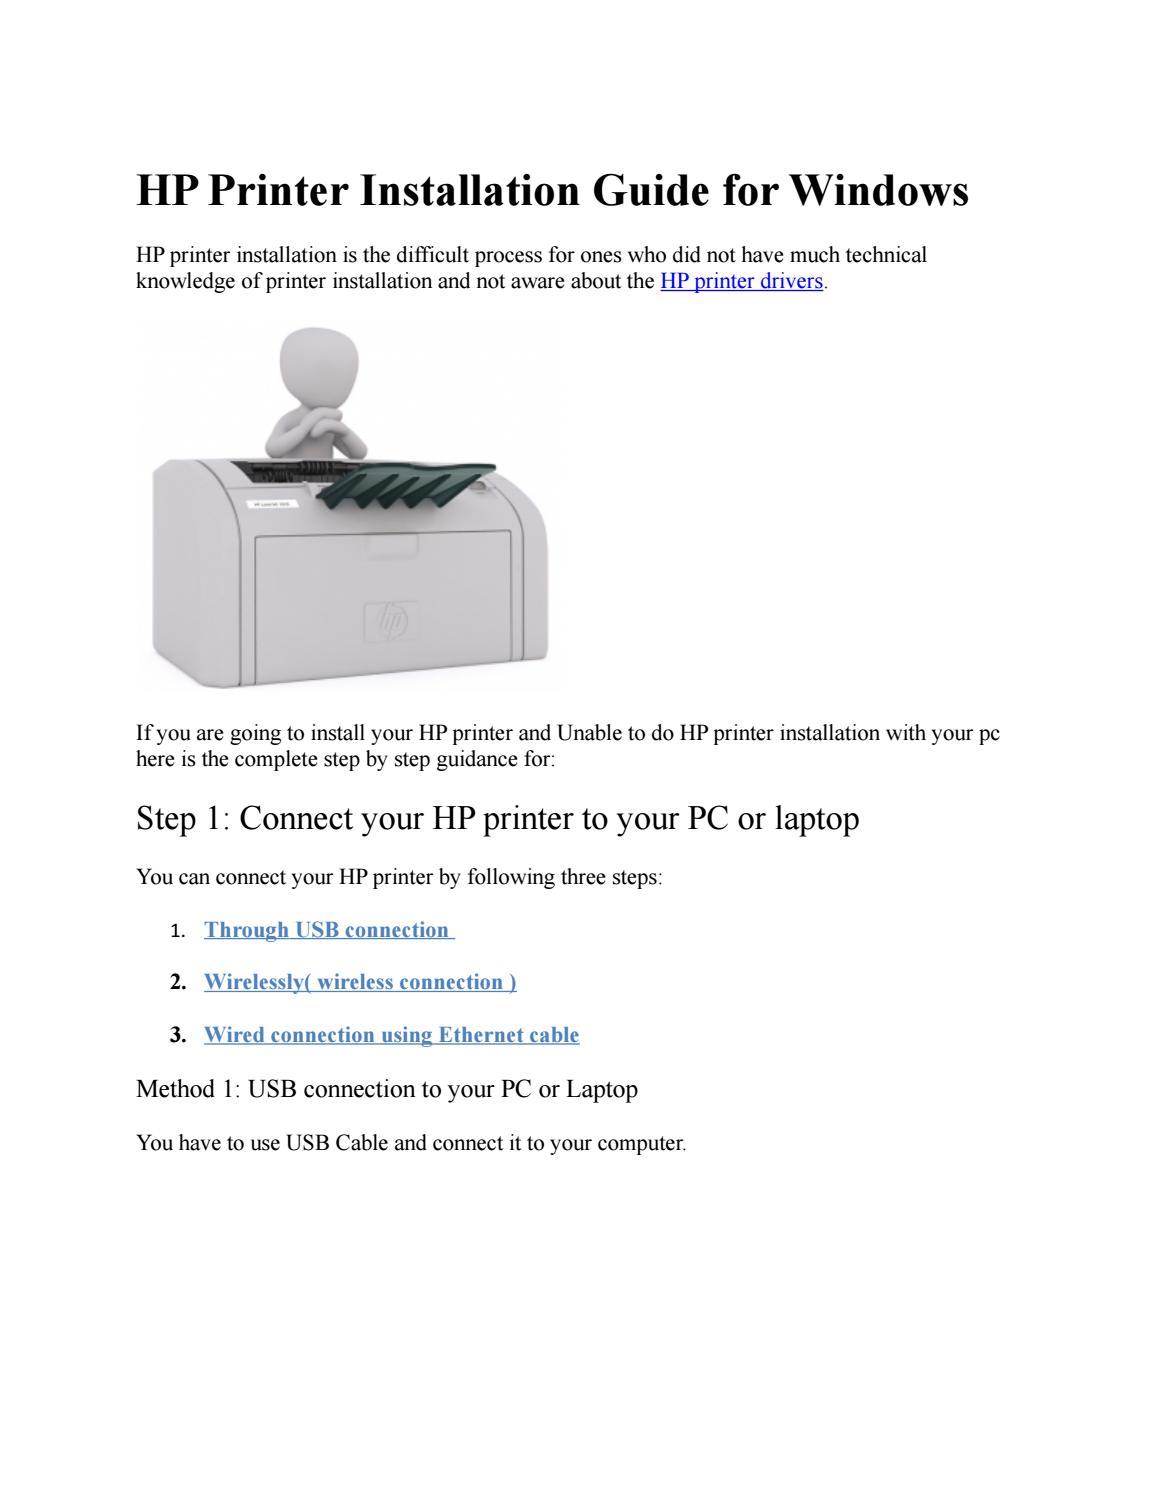 Fix Hp printer installation issue | 1-877-353-6650 | HP